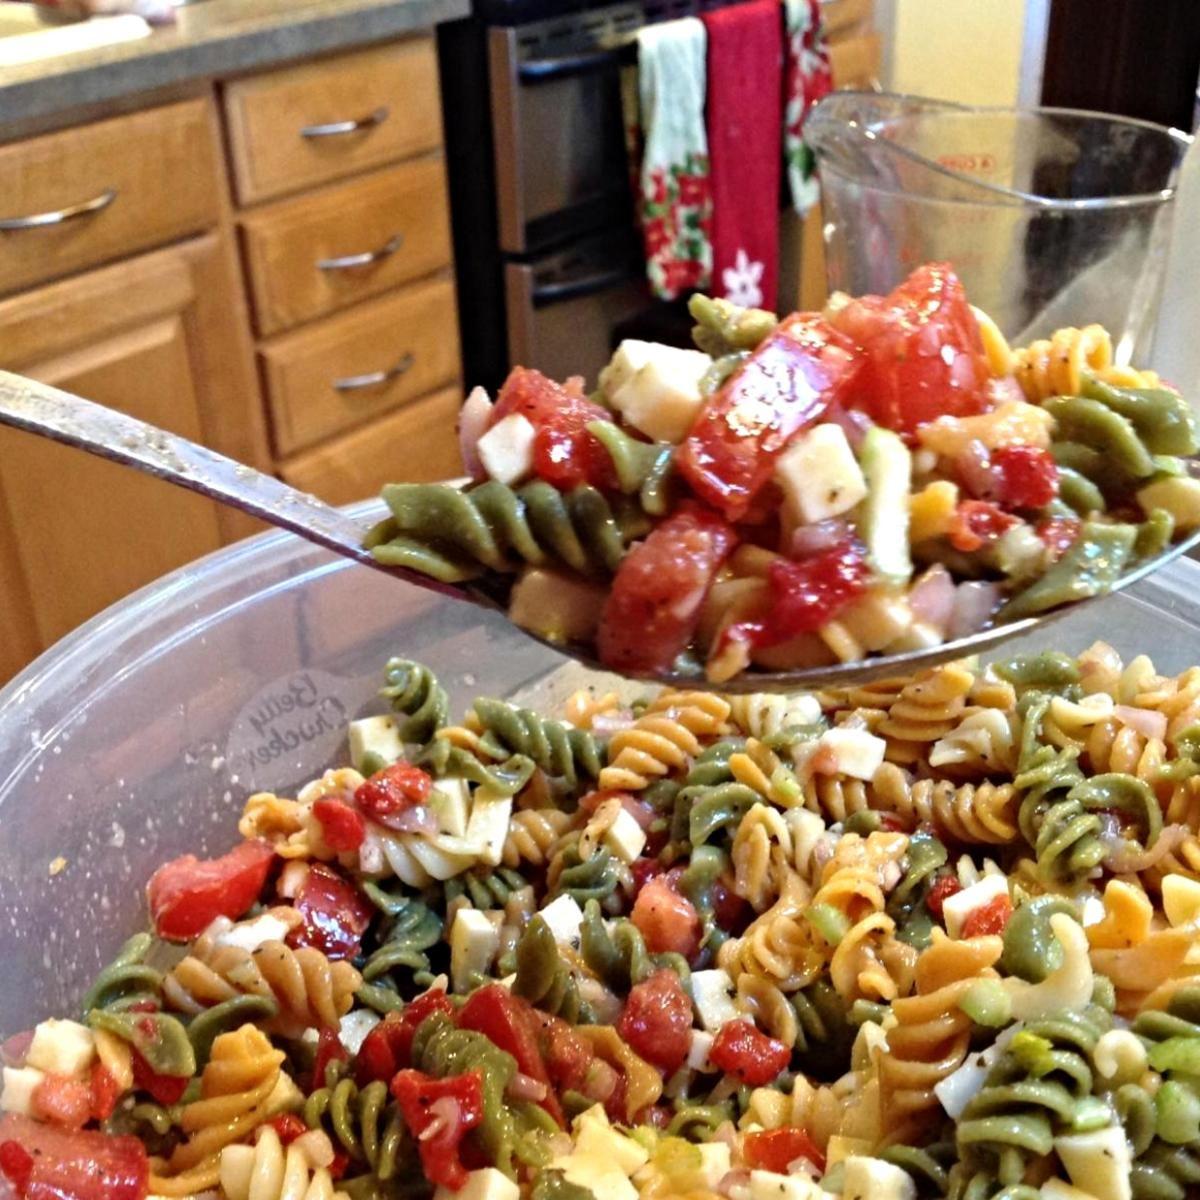 Garden Rotini Pasta Salad | Recipe | Pinterest | Pasta salad, Pasta ...